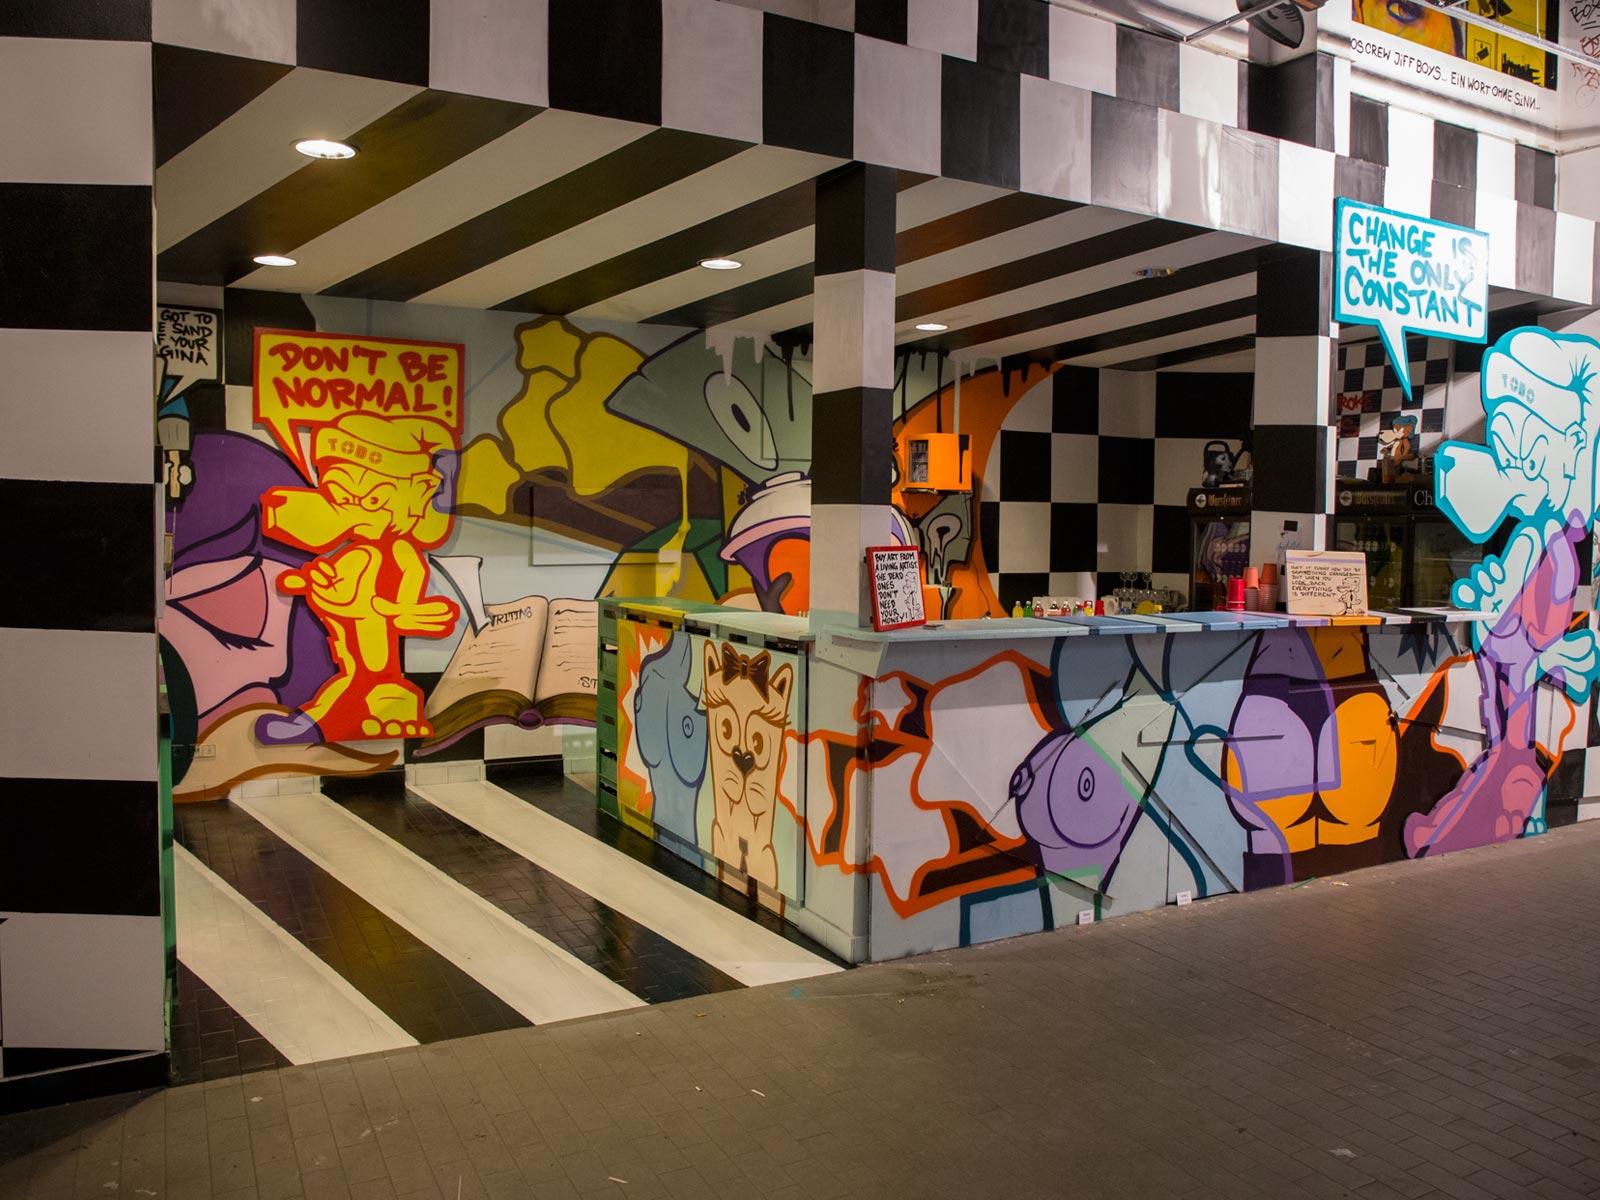 Raumgestaltung wandelism Bar Aerosolikz Tobo Gesamtbild